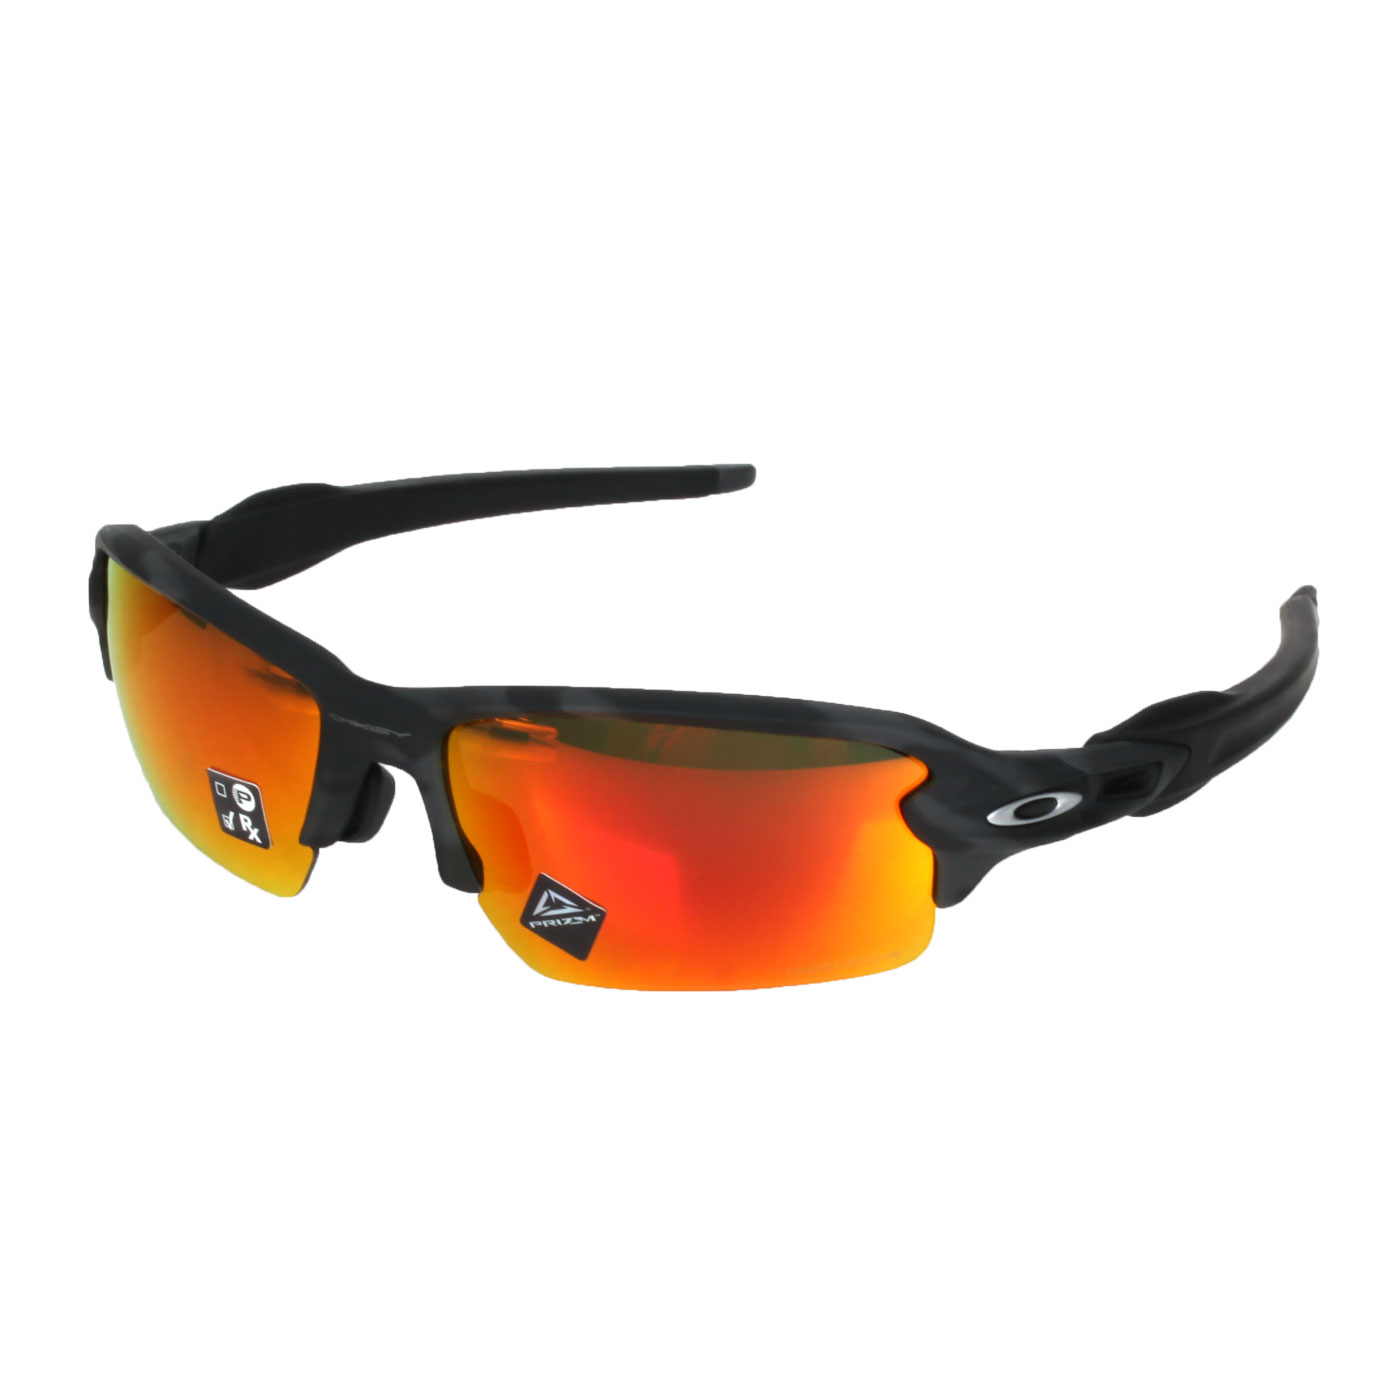 OAKLEY FLAK 2.0一般太陽眼鏡(附硬盒鼻墊) OAK-OO9271-2761 - 黑灰橘紅